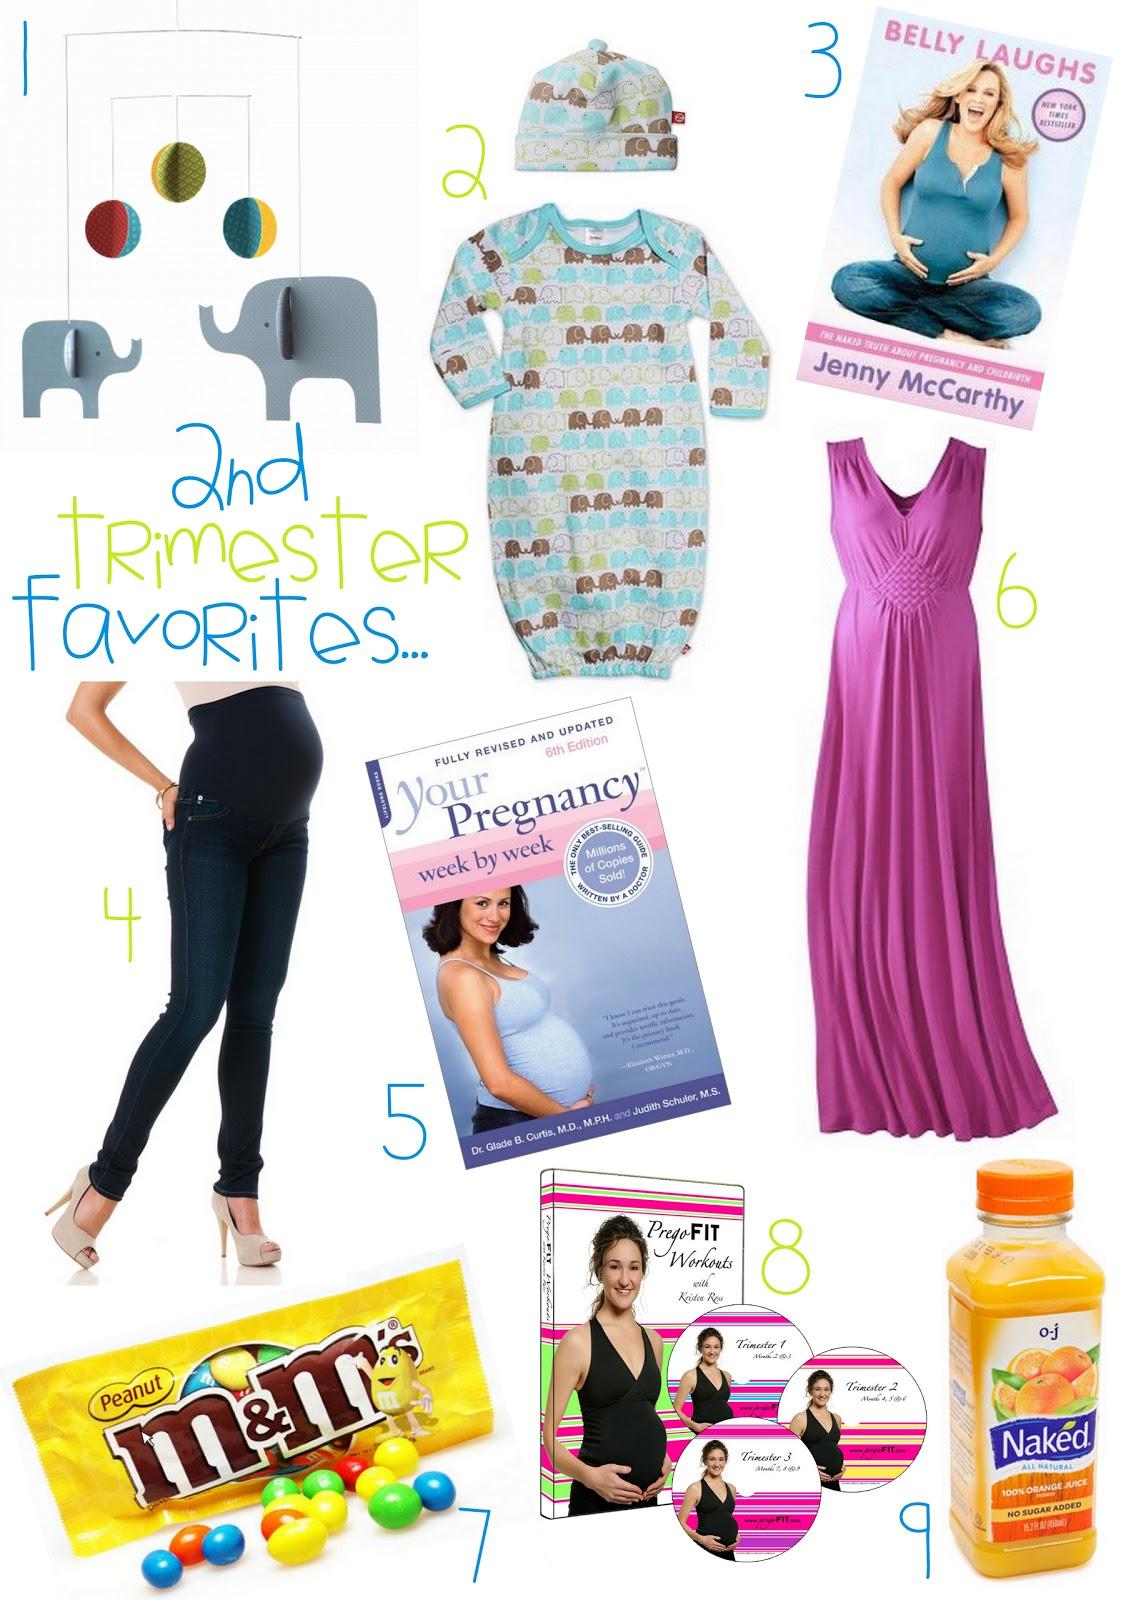 http://1.bp.blogspot.com/-oQaqaQySNVM/T9S_W5DhexI/AAAAAAAADtI/LD_h9pfqReU/s1600/2nd+trimester+favorites.jpg